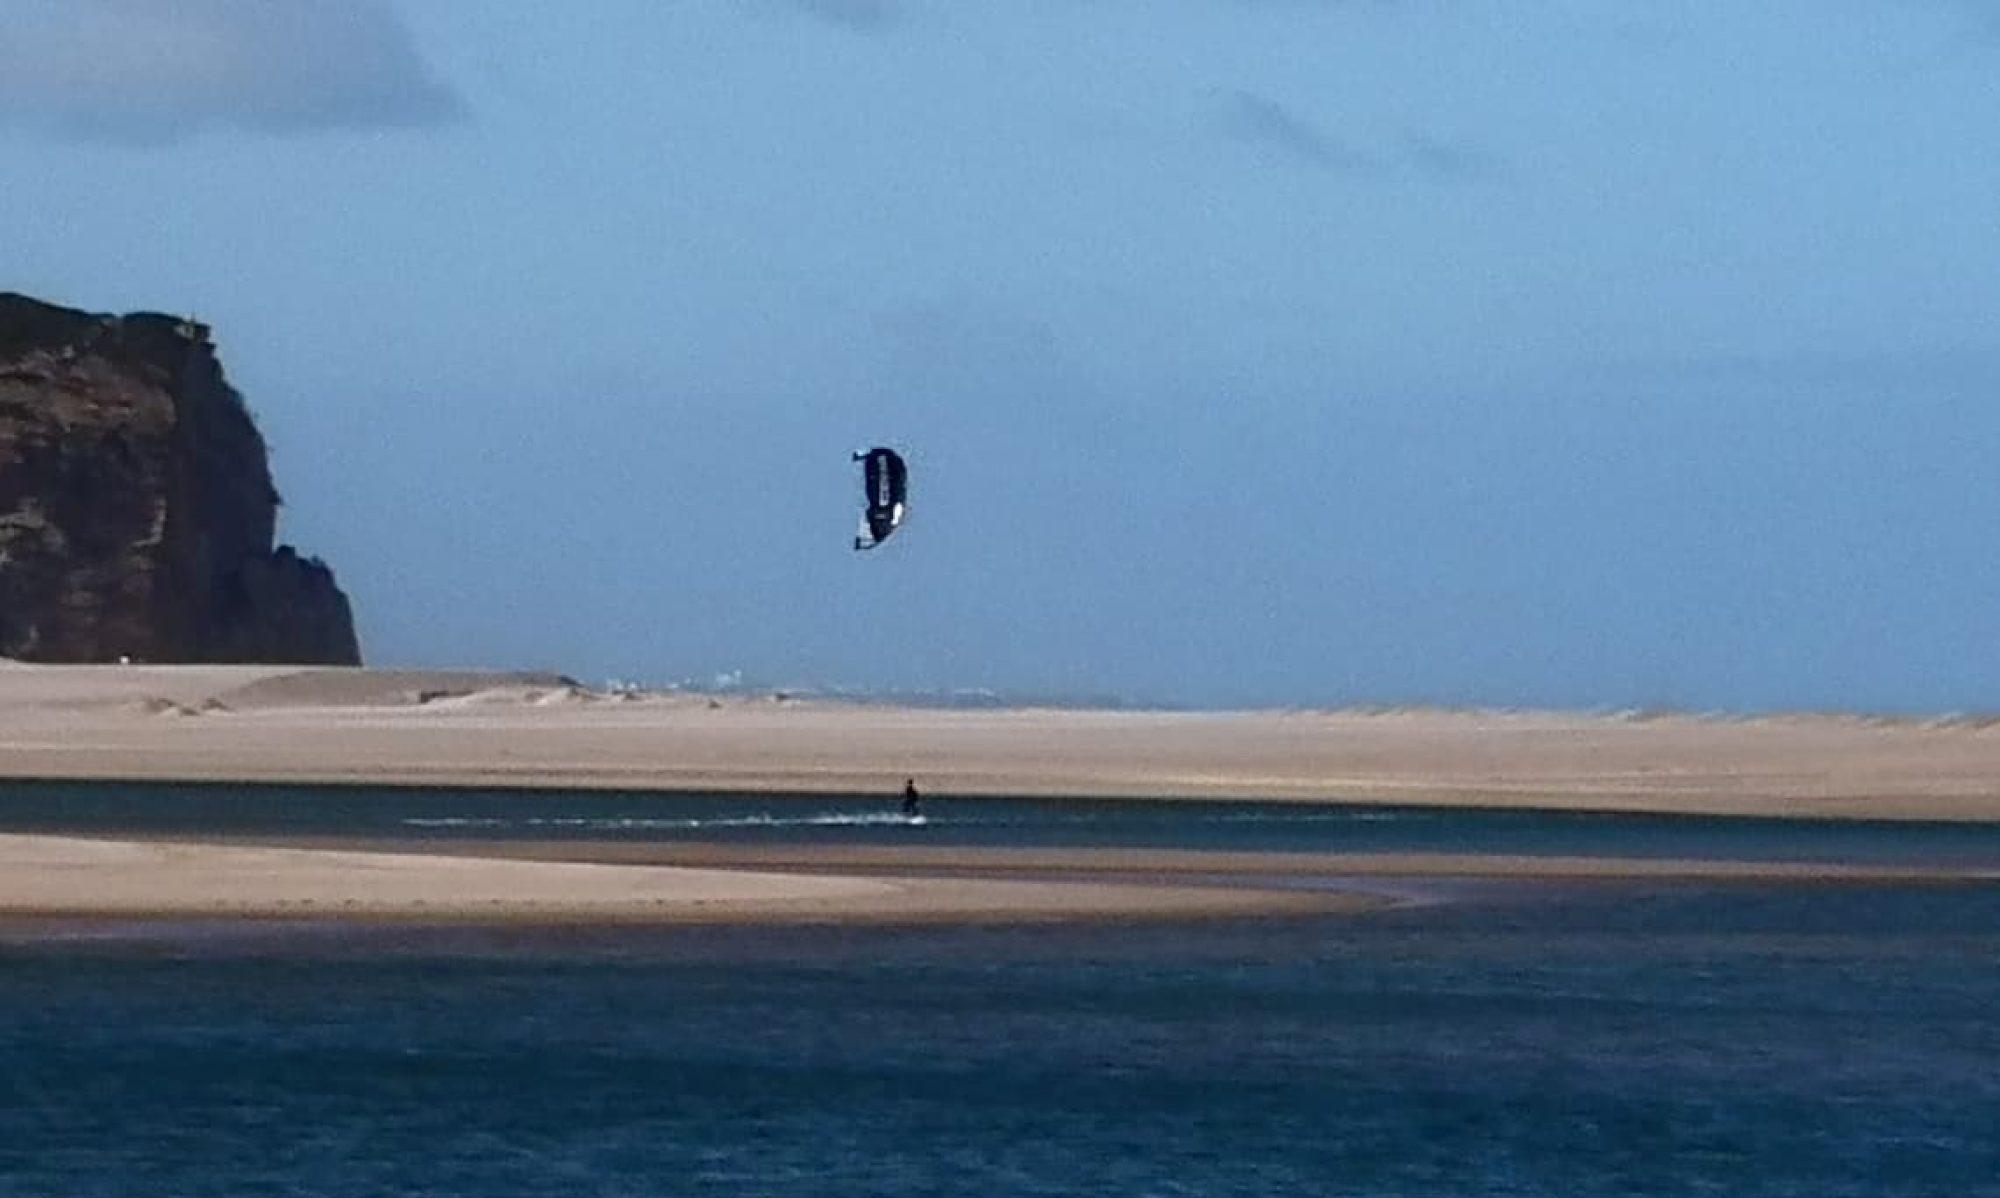 Kiteschule Portugal